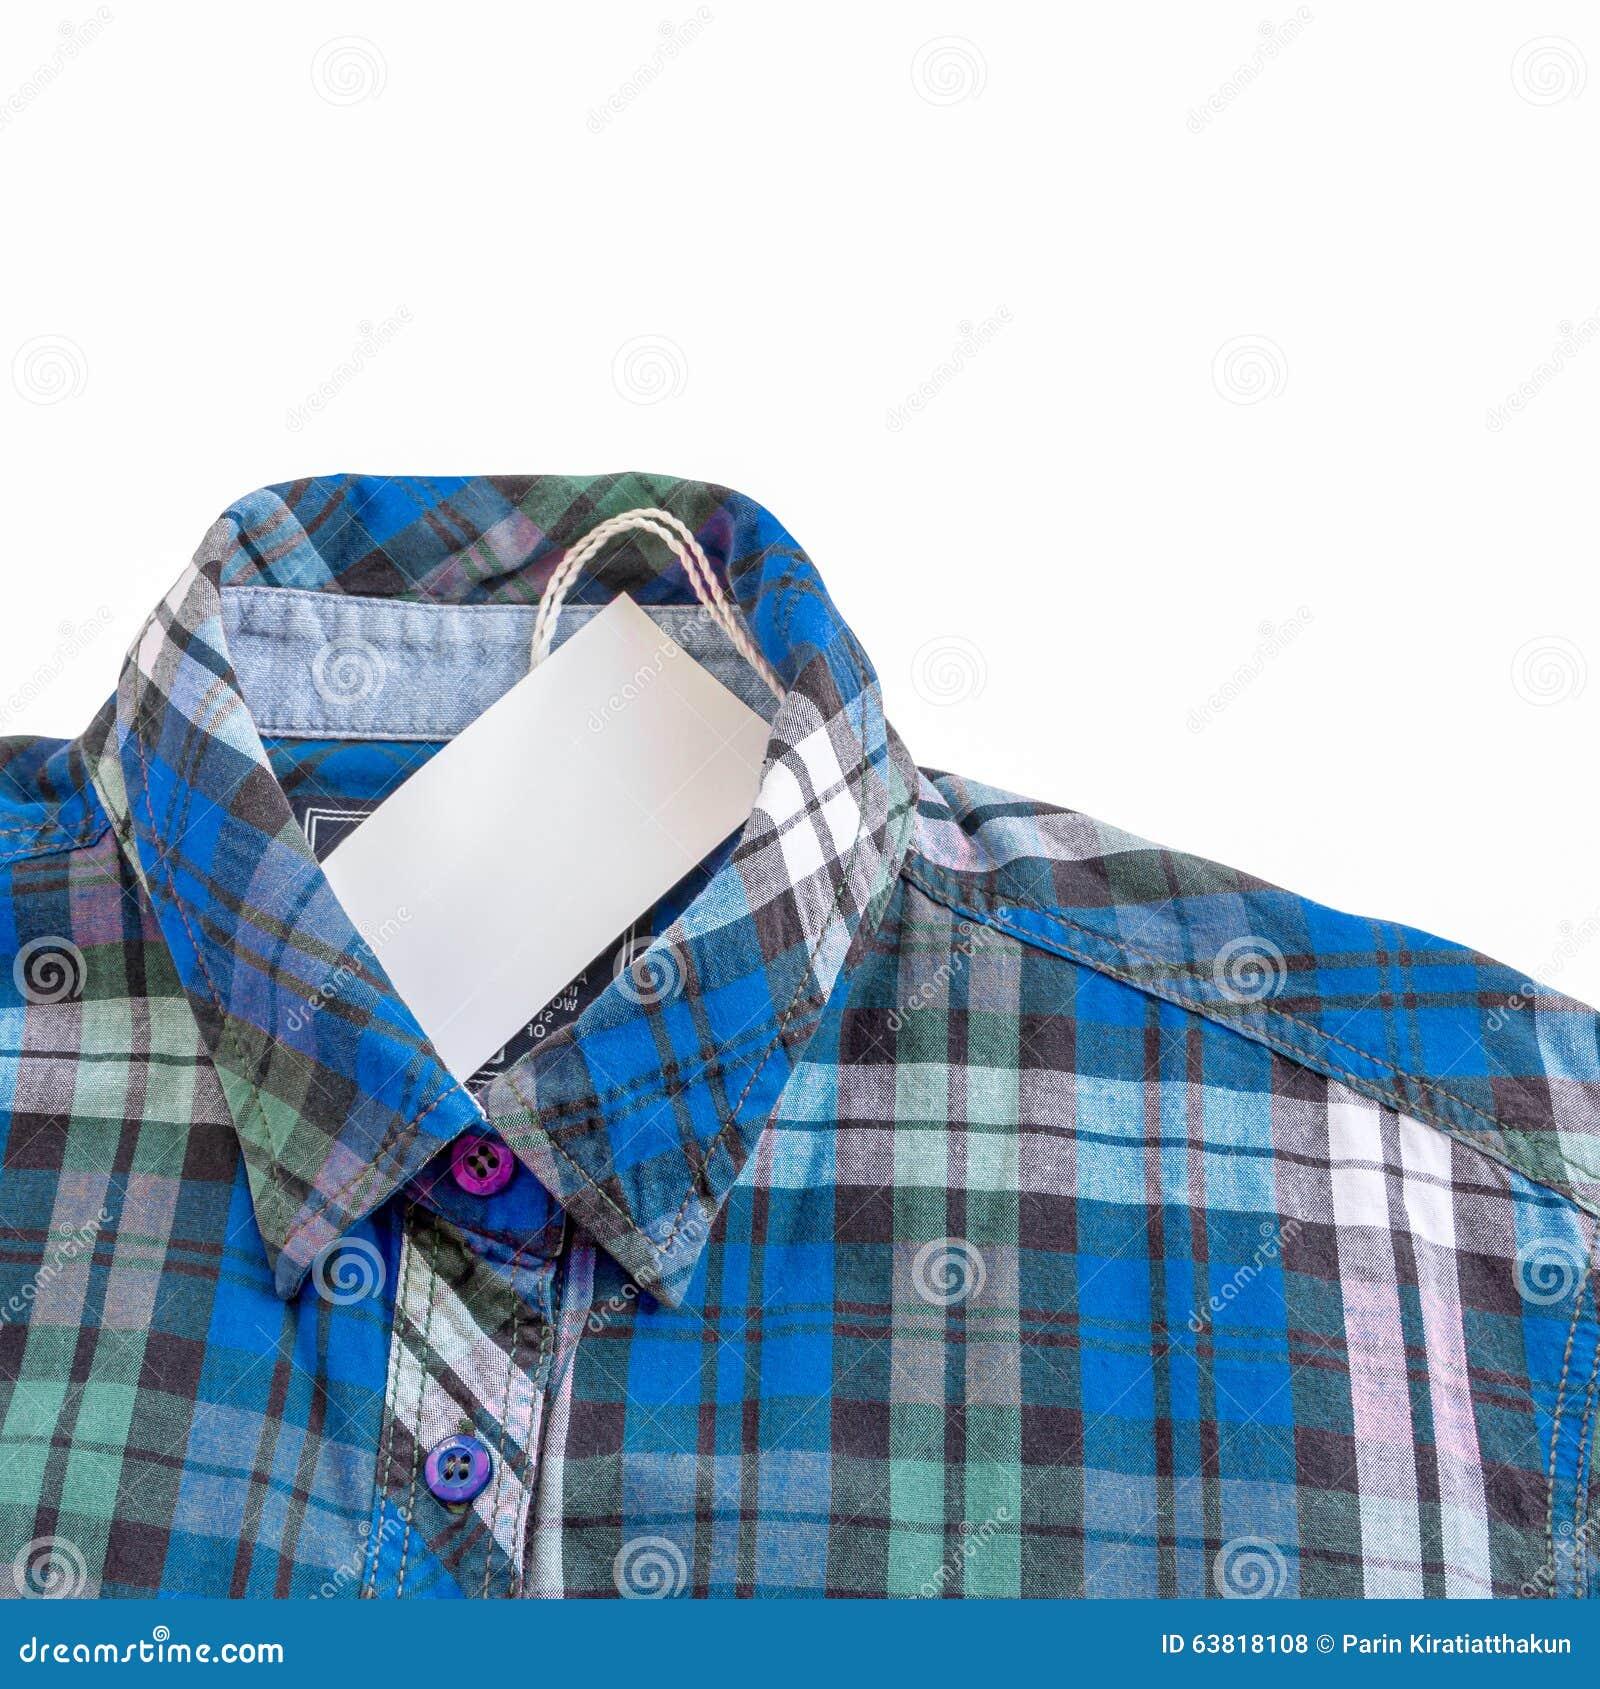 Zinc shirt design - Blue Zinc Texture Plaid Shirt On White